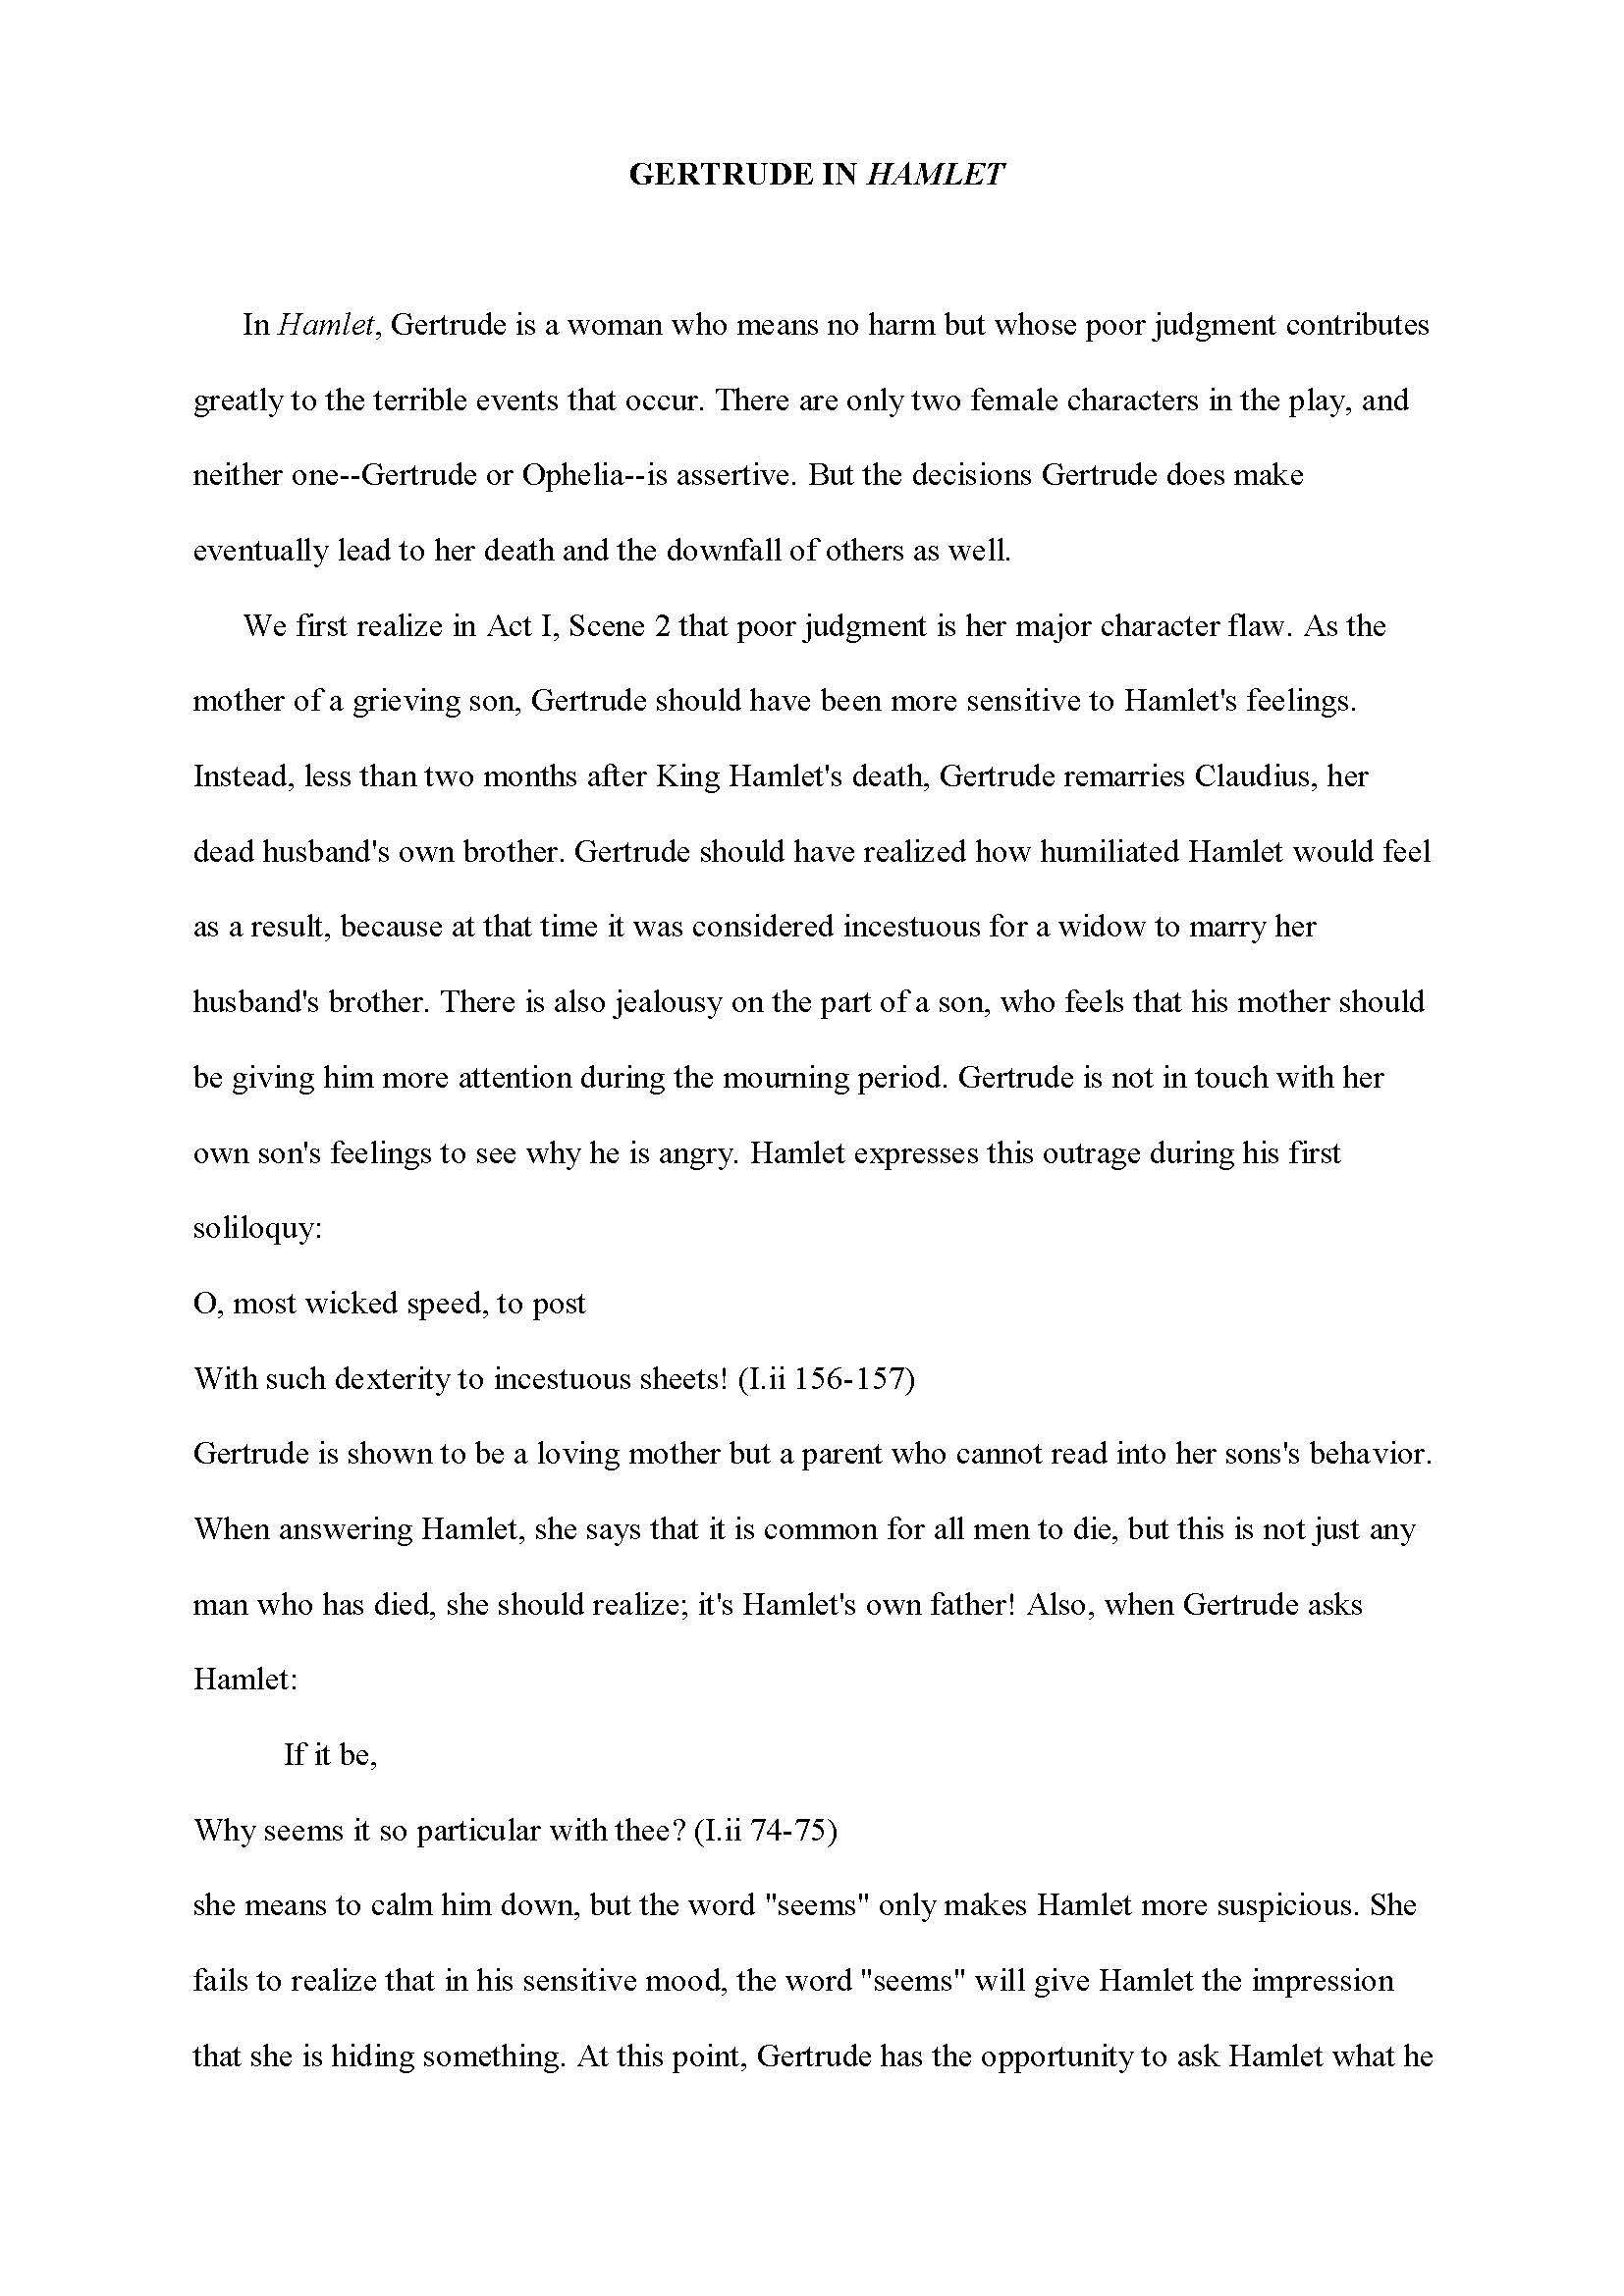 012 Analysis Essay Sample Example Essays On Unbelievable Racism In Schools Best Argumentative Full